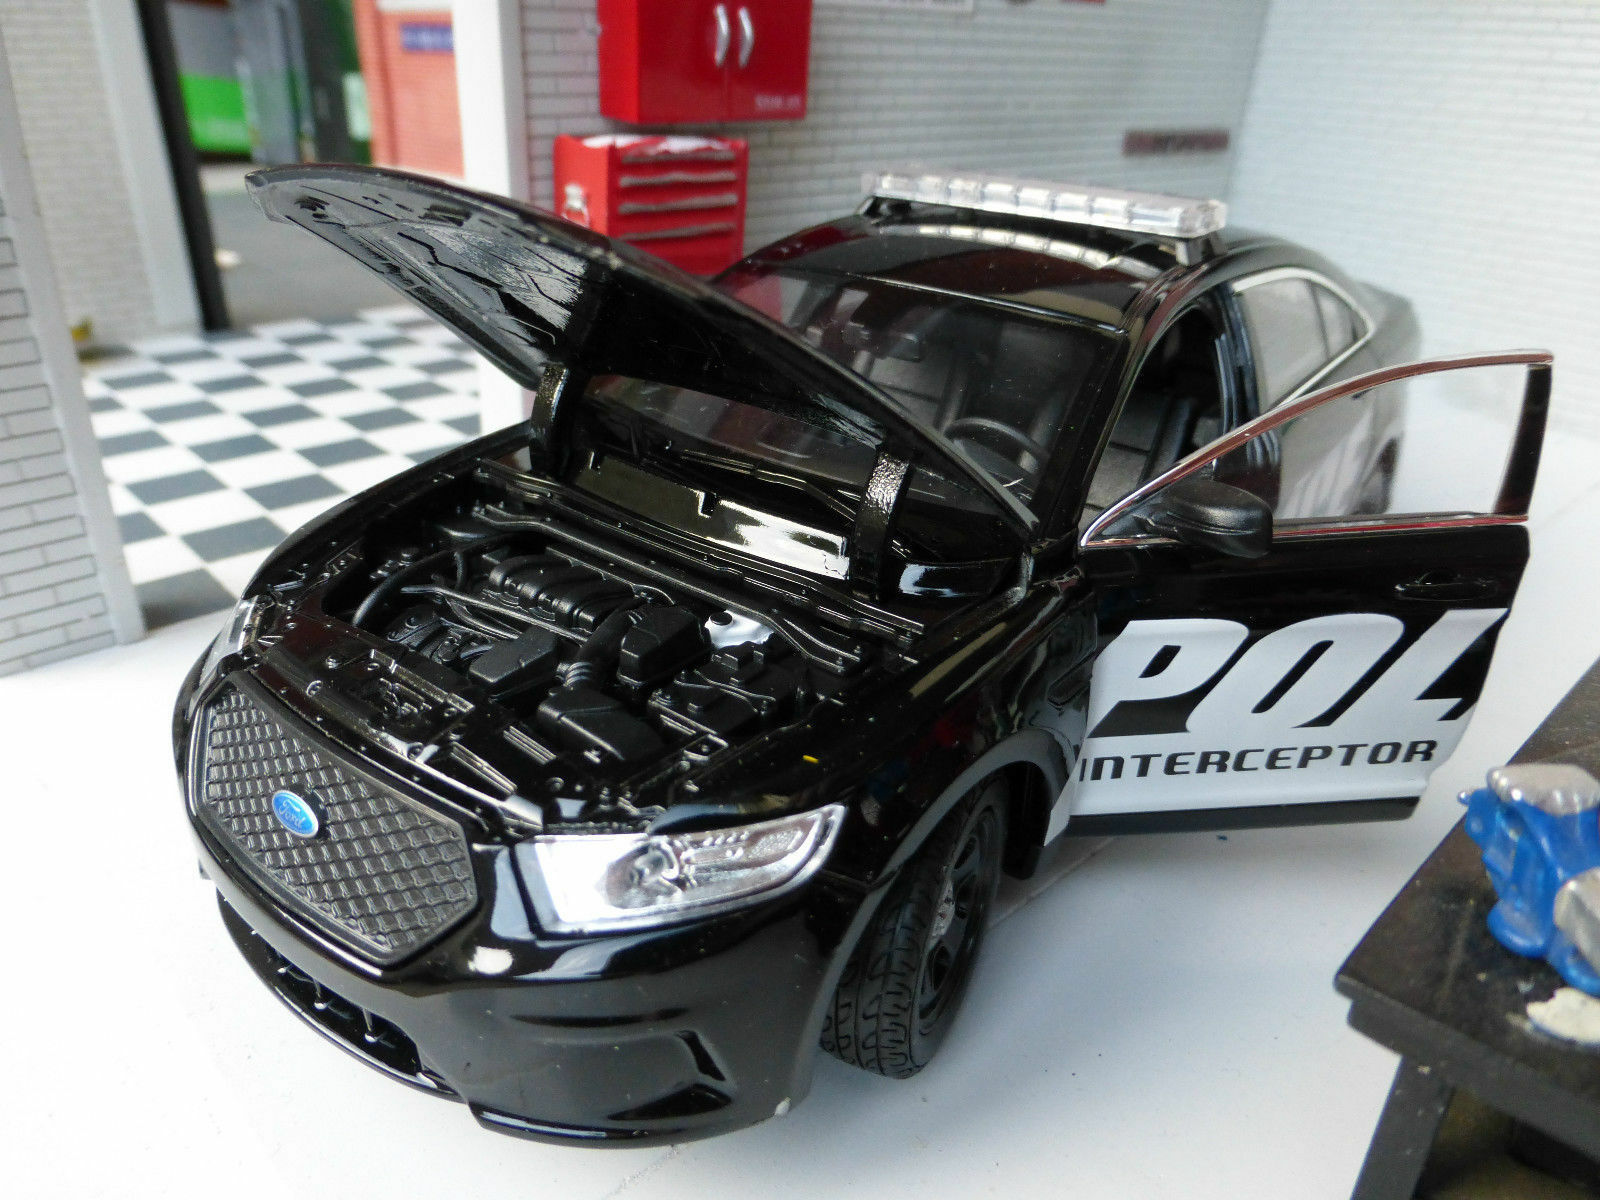 LGB G G G 1 24 Escala negro Ford Taurus Policía INTERCEPTOR DETALLADO Modelo Por 0ca4e0